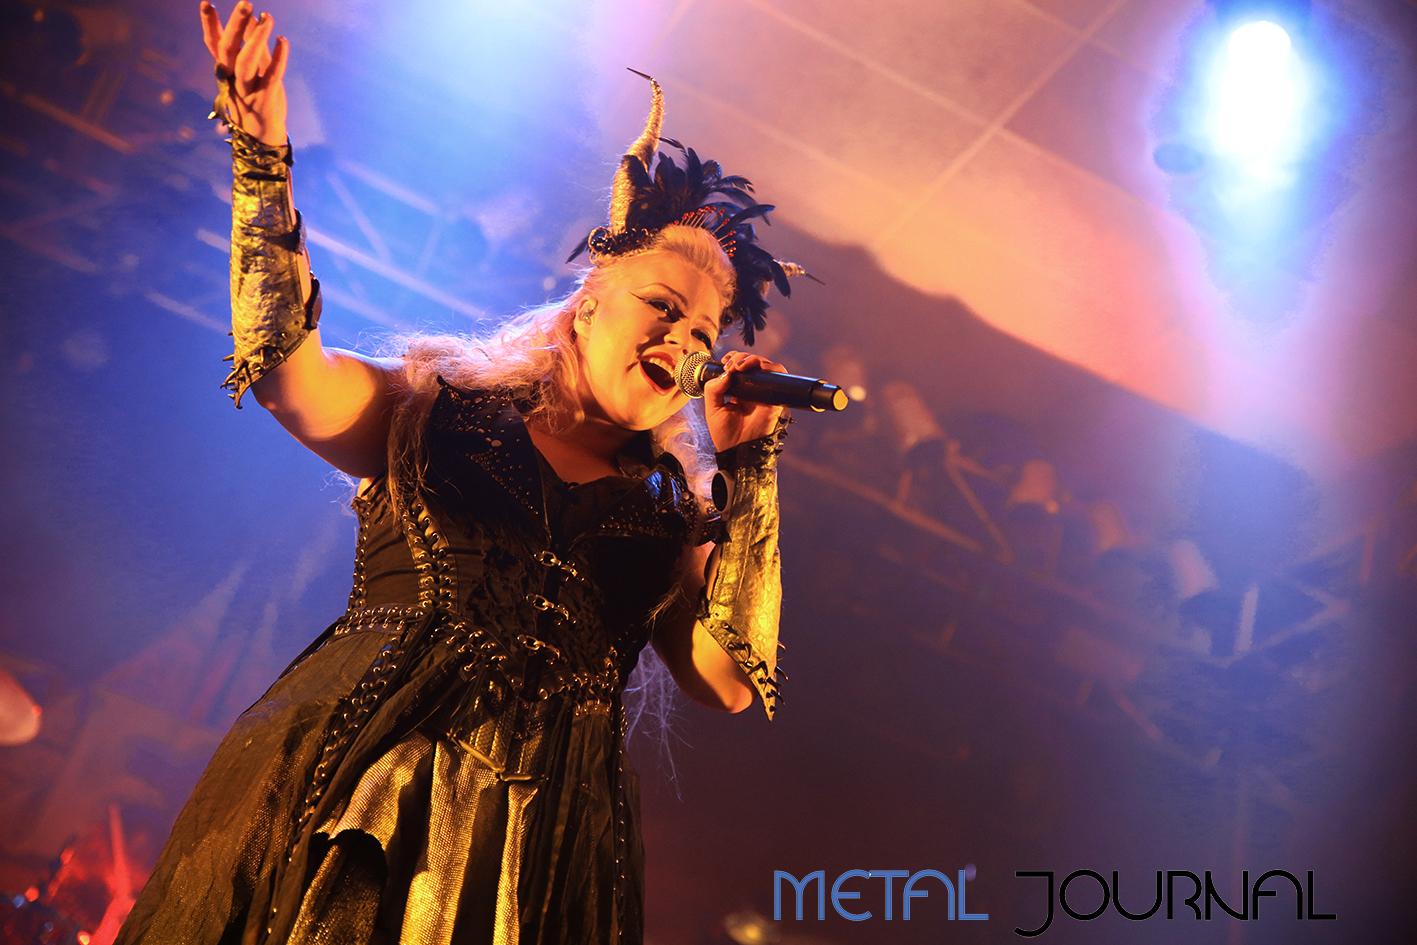 battle beast metal journal bilbao 2019 pic 10